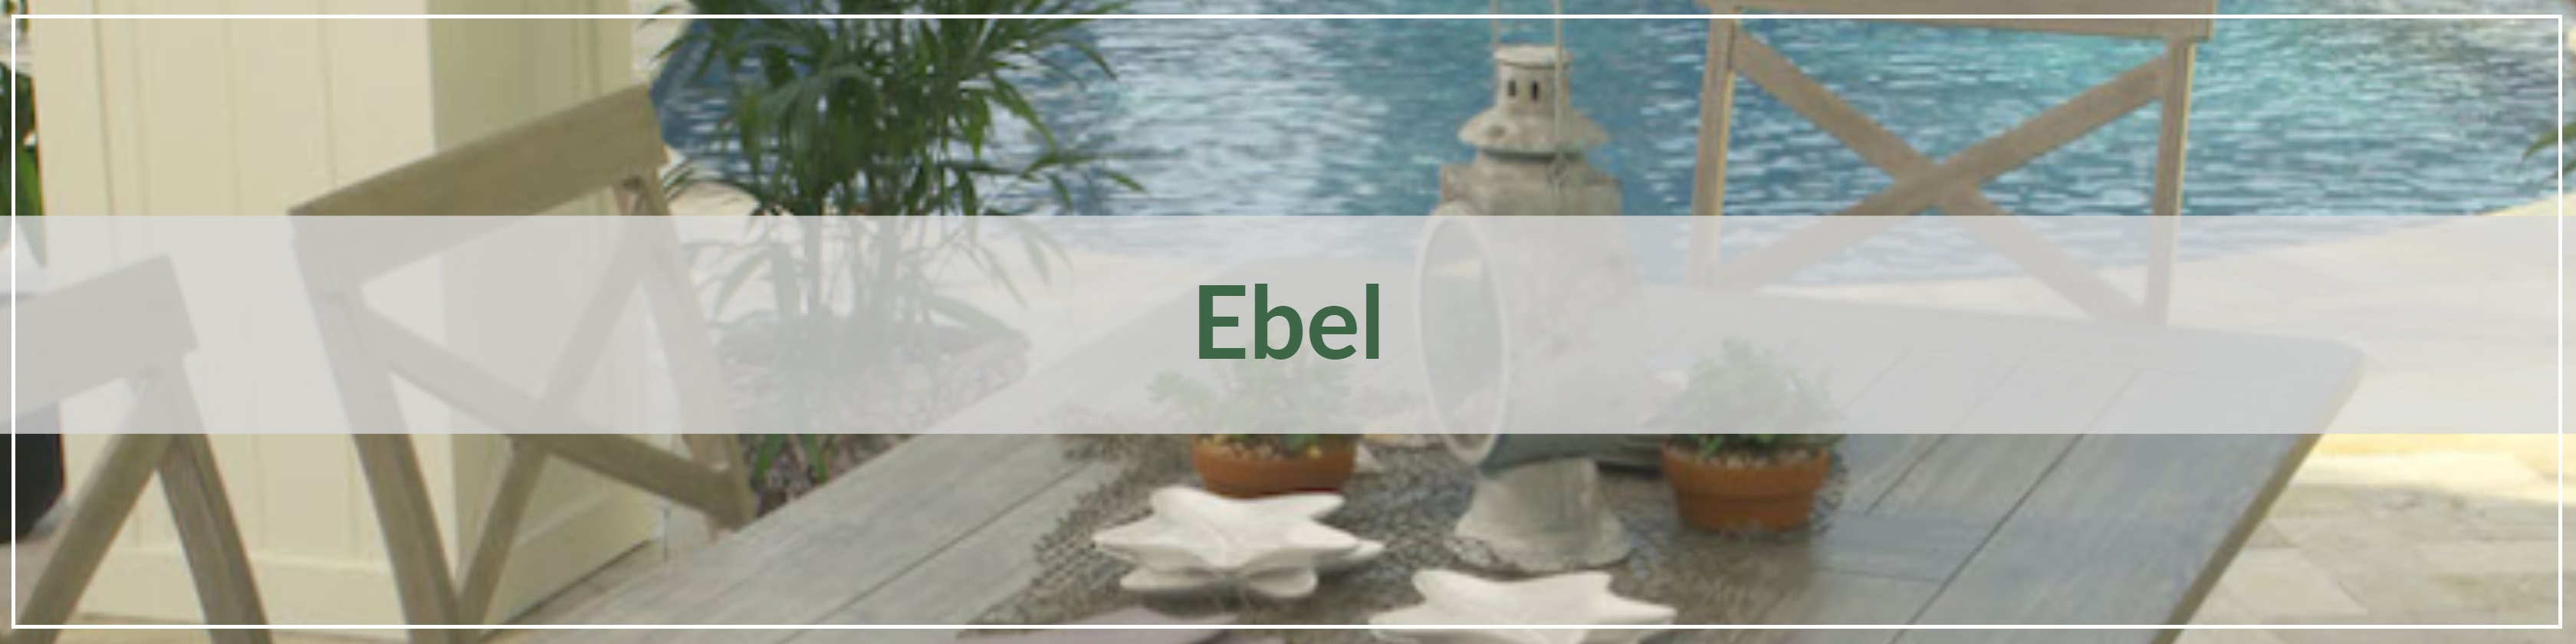 Ebel Extruded Aluminum Outdoor Dining